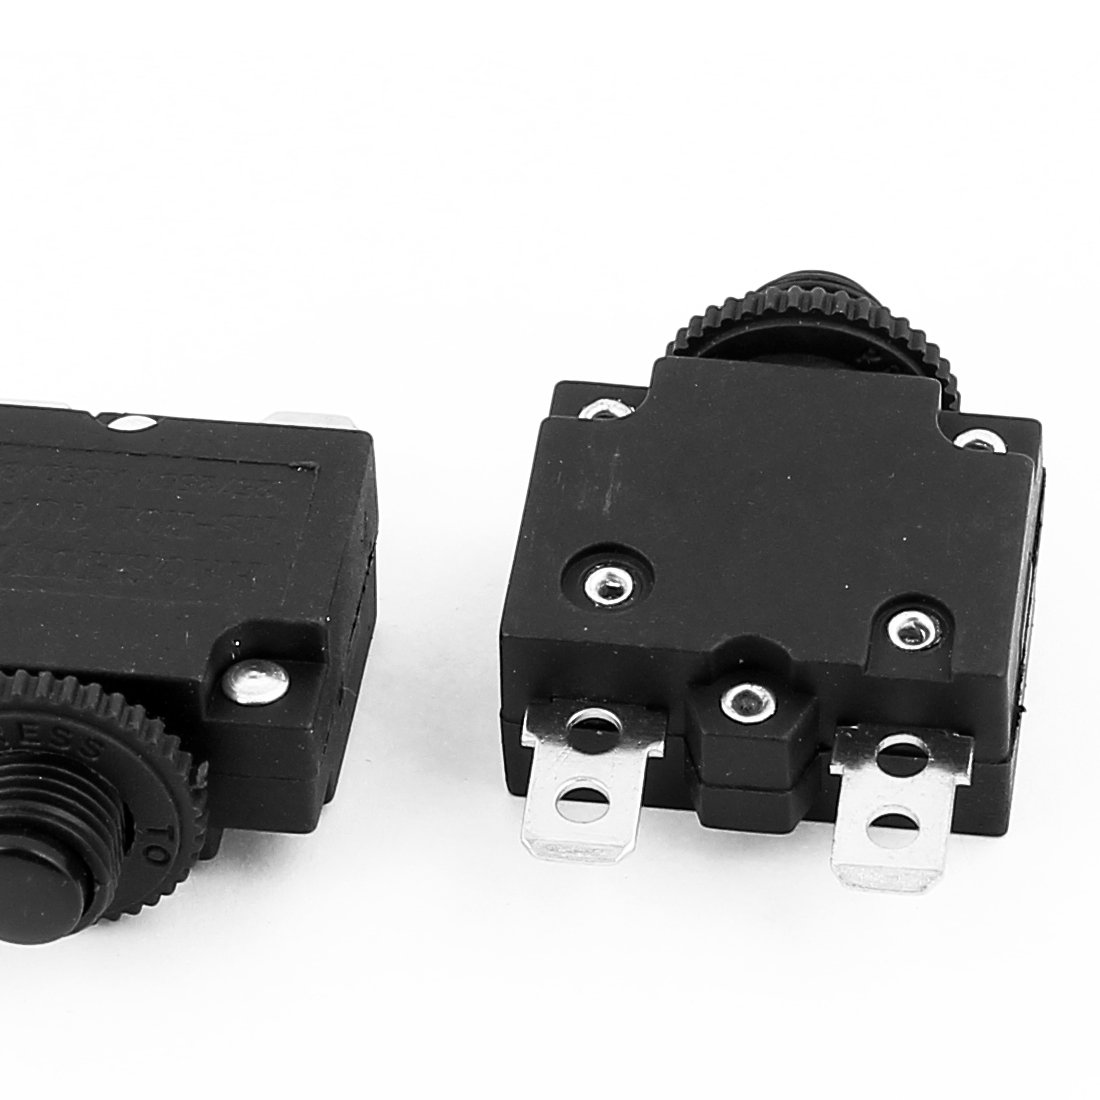 SOURCING MAP sourcingmap/® AC125V//250V 10A HS-R01 Interruptor autom/ático del compresor de aire en el circuito de protecci/ón de sobrecarga 7 pcs